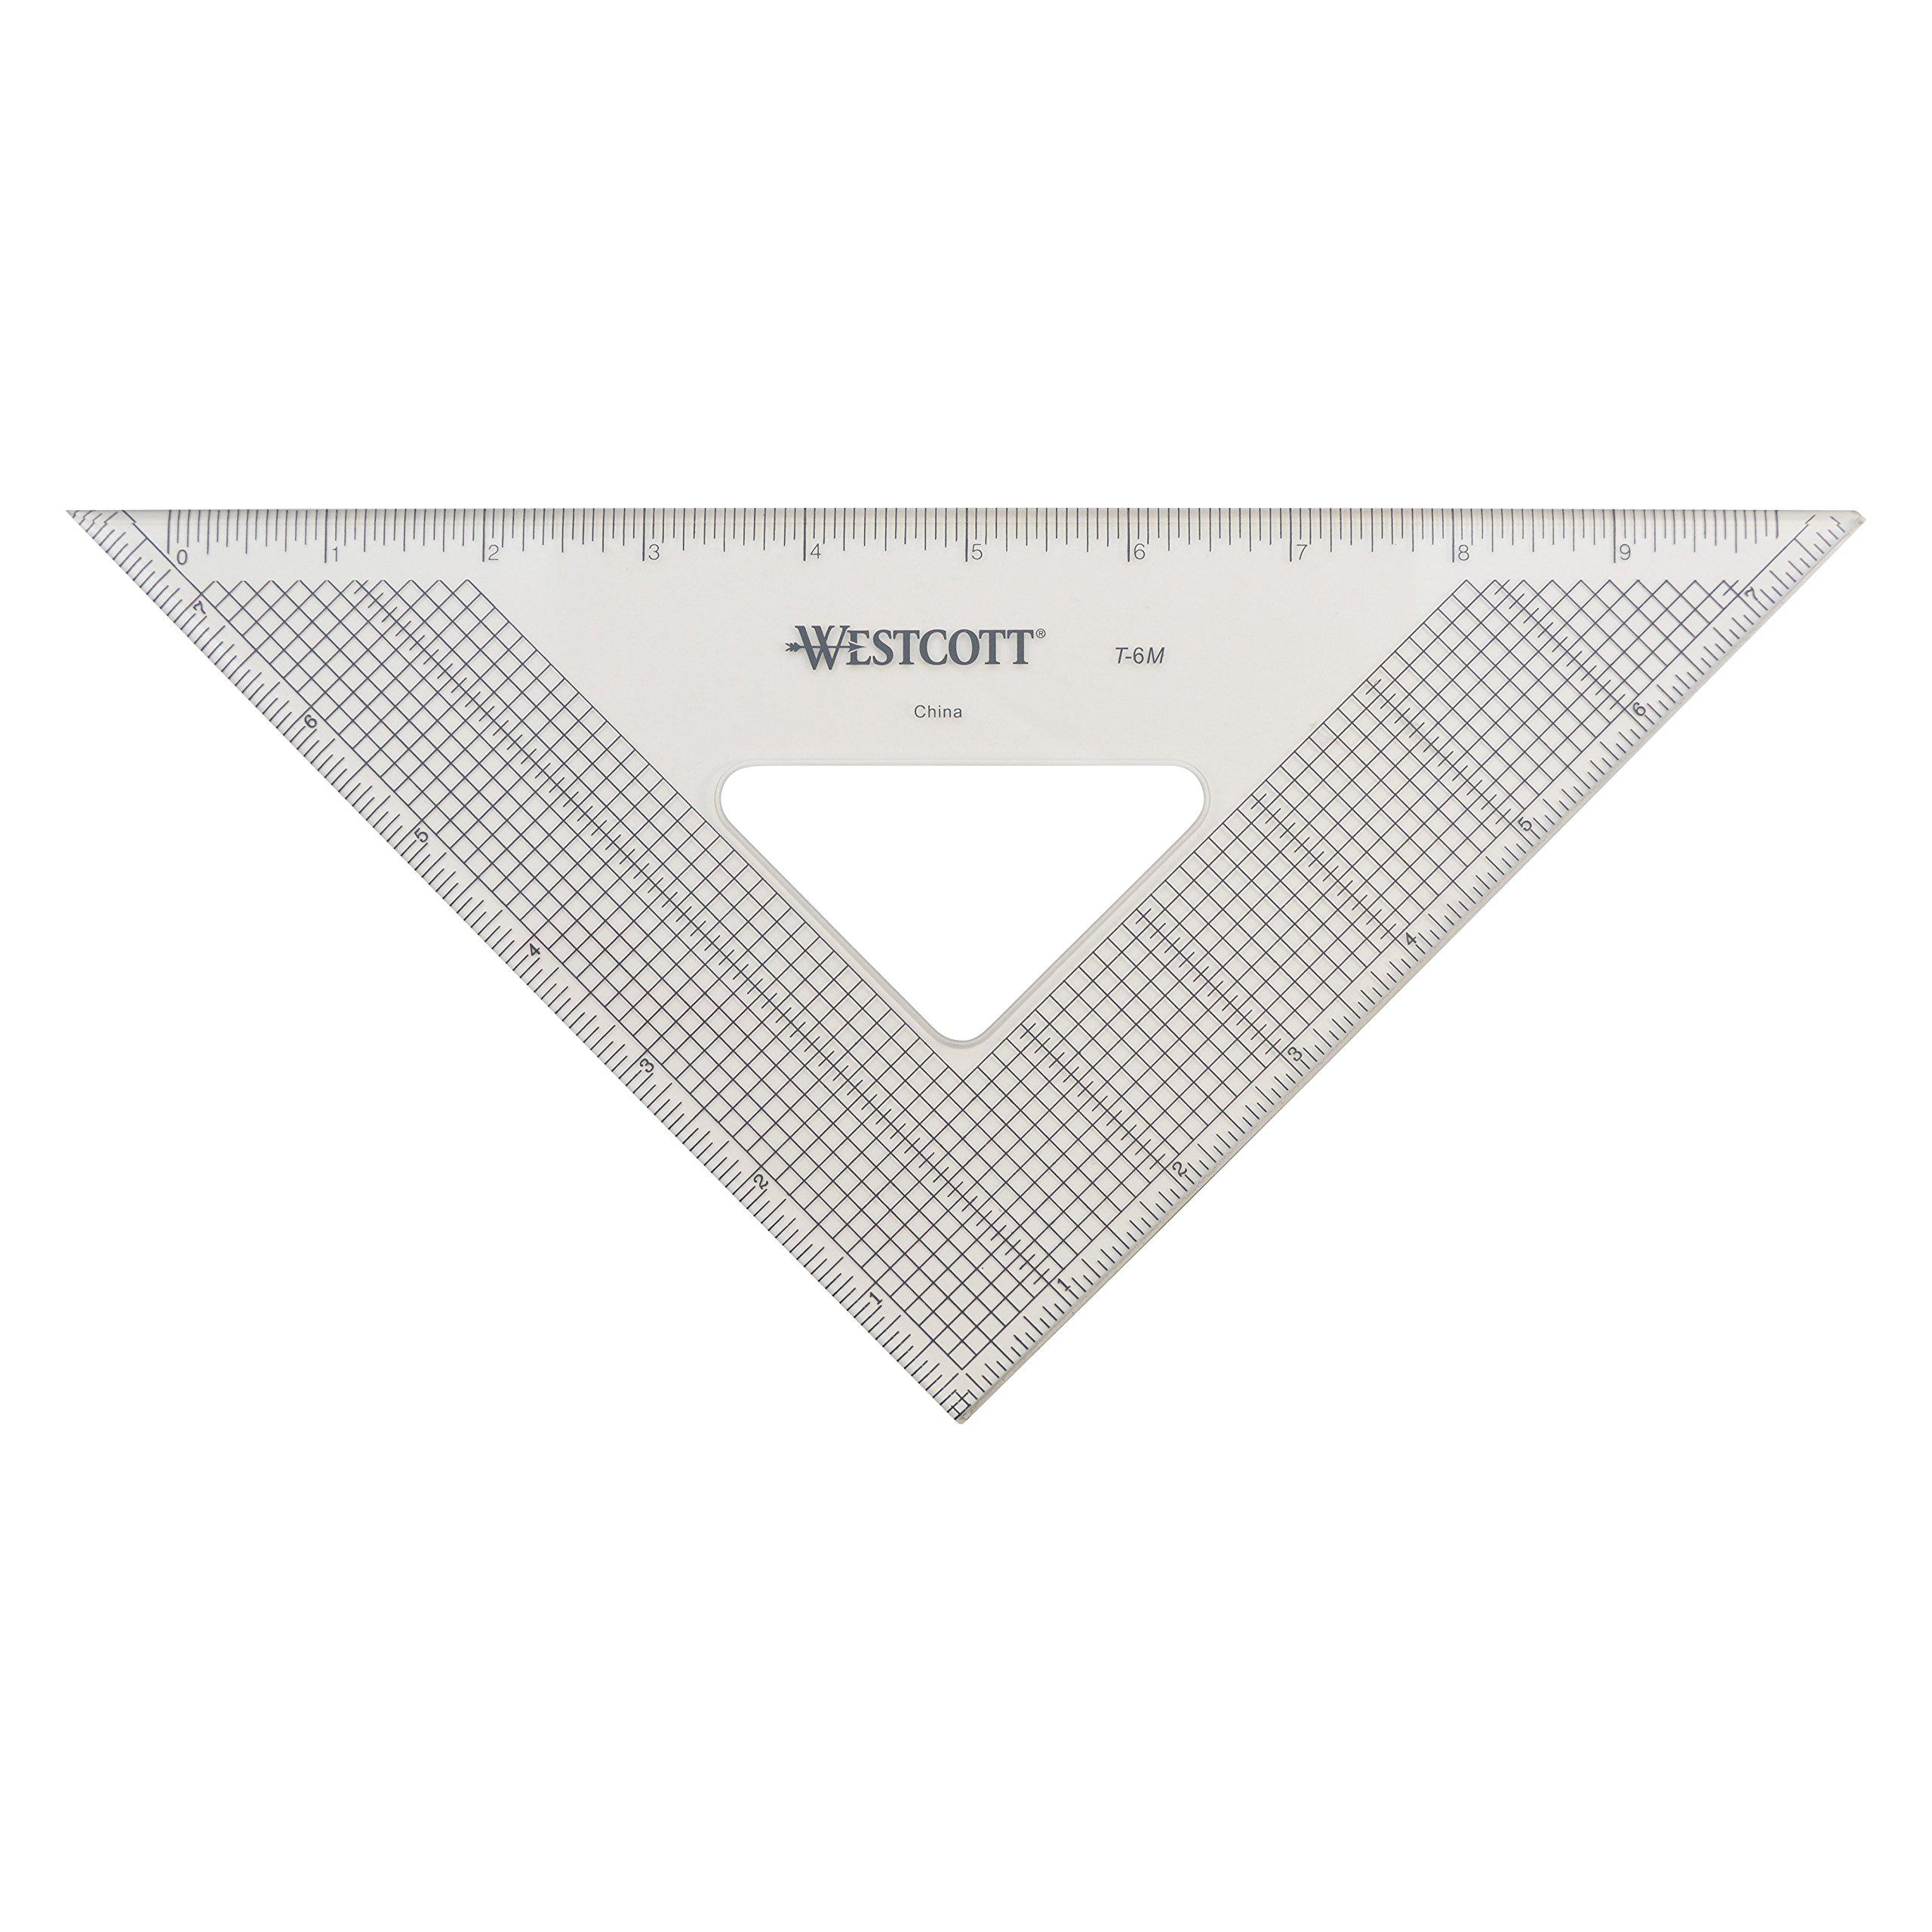 Westcott Grid Triangle, 8'', 45/90 Degree, Transparent (T-6M) by Westcott